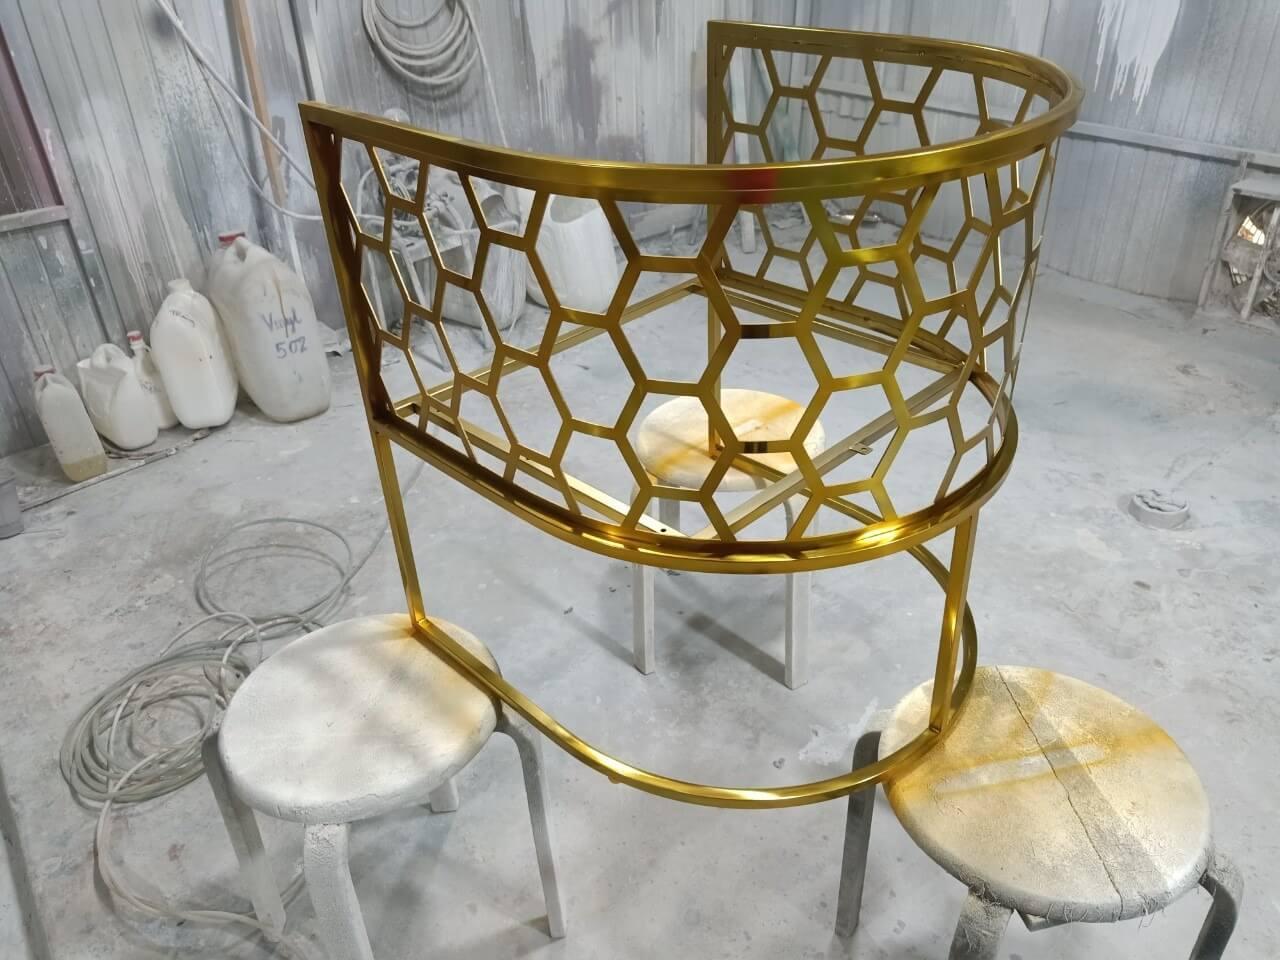 Metal-Chair_shiny-Brass-finish